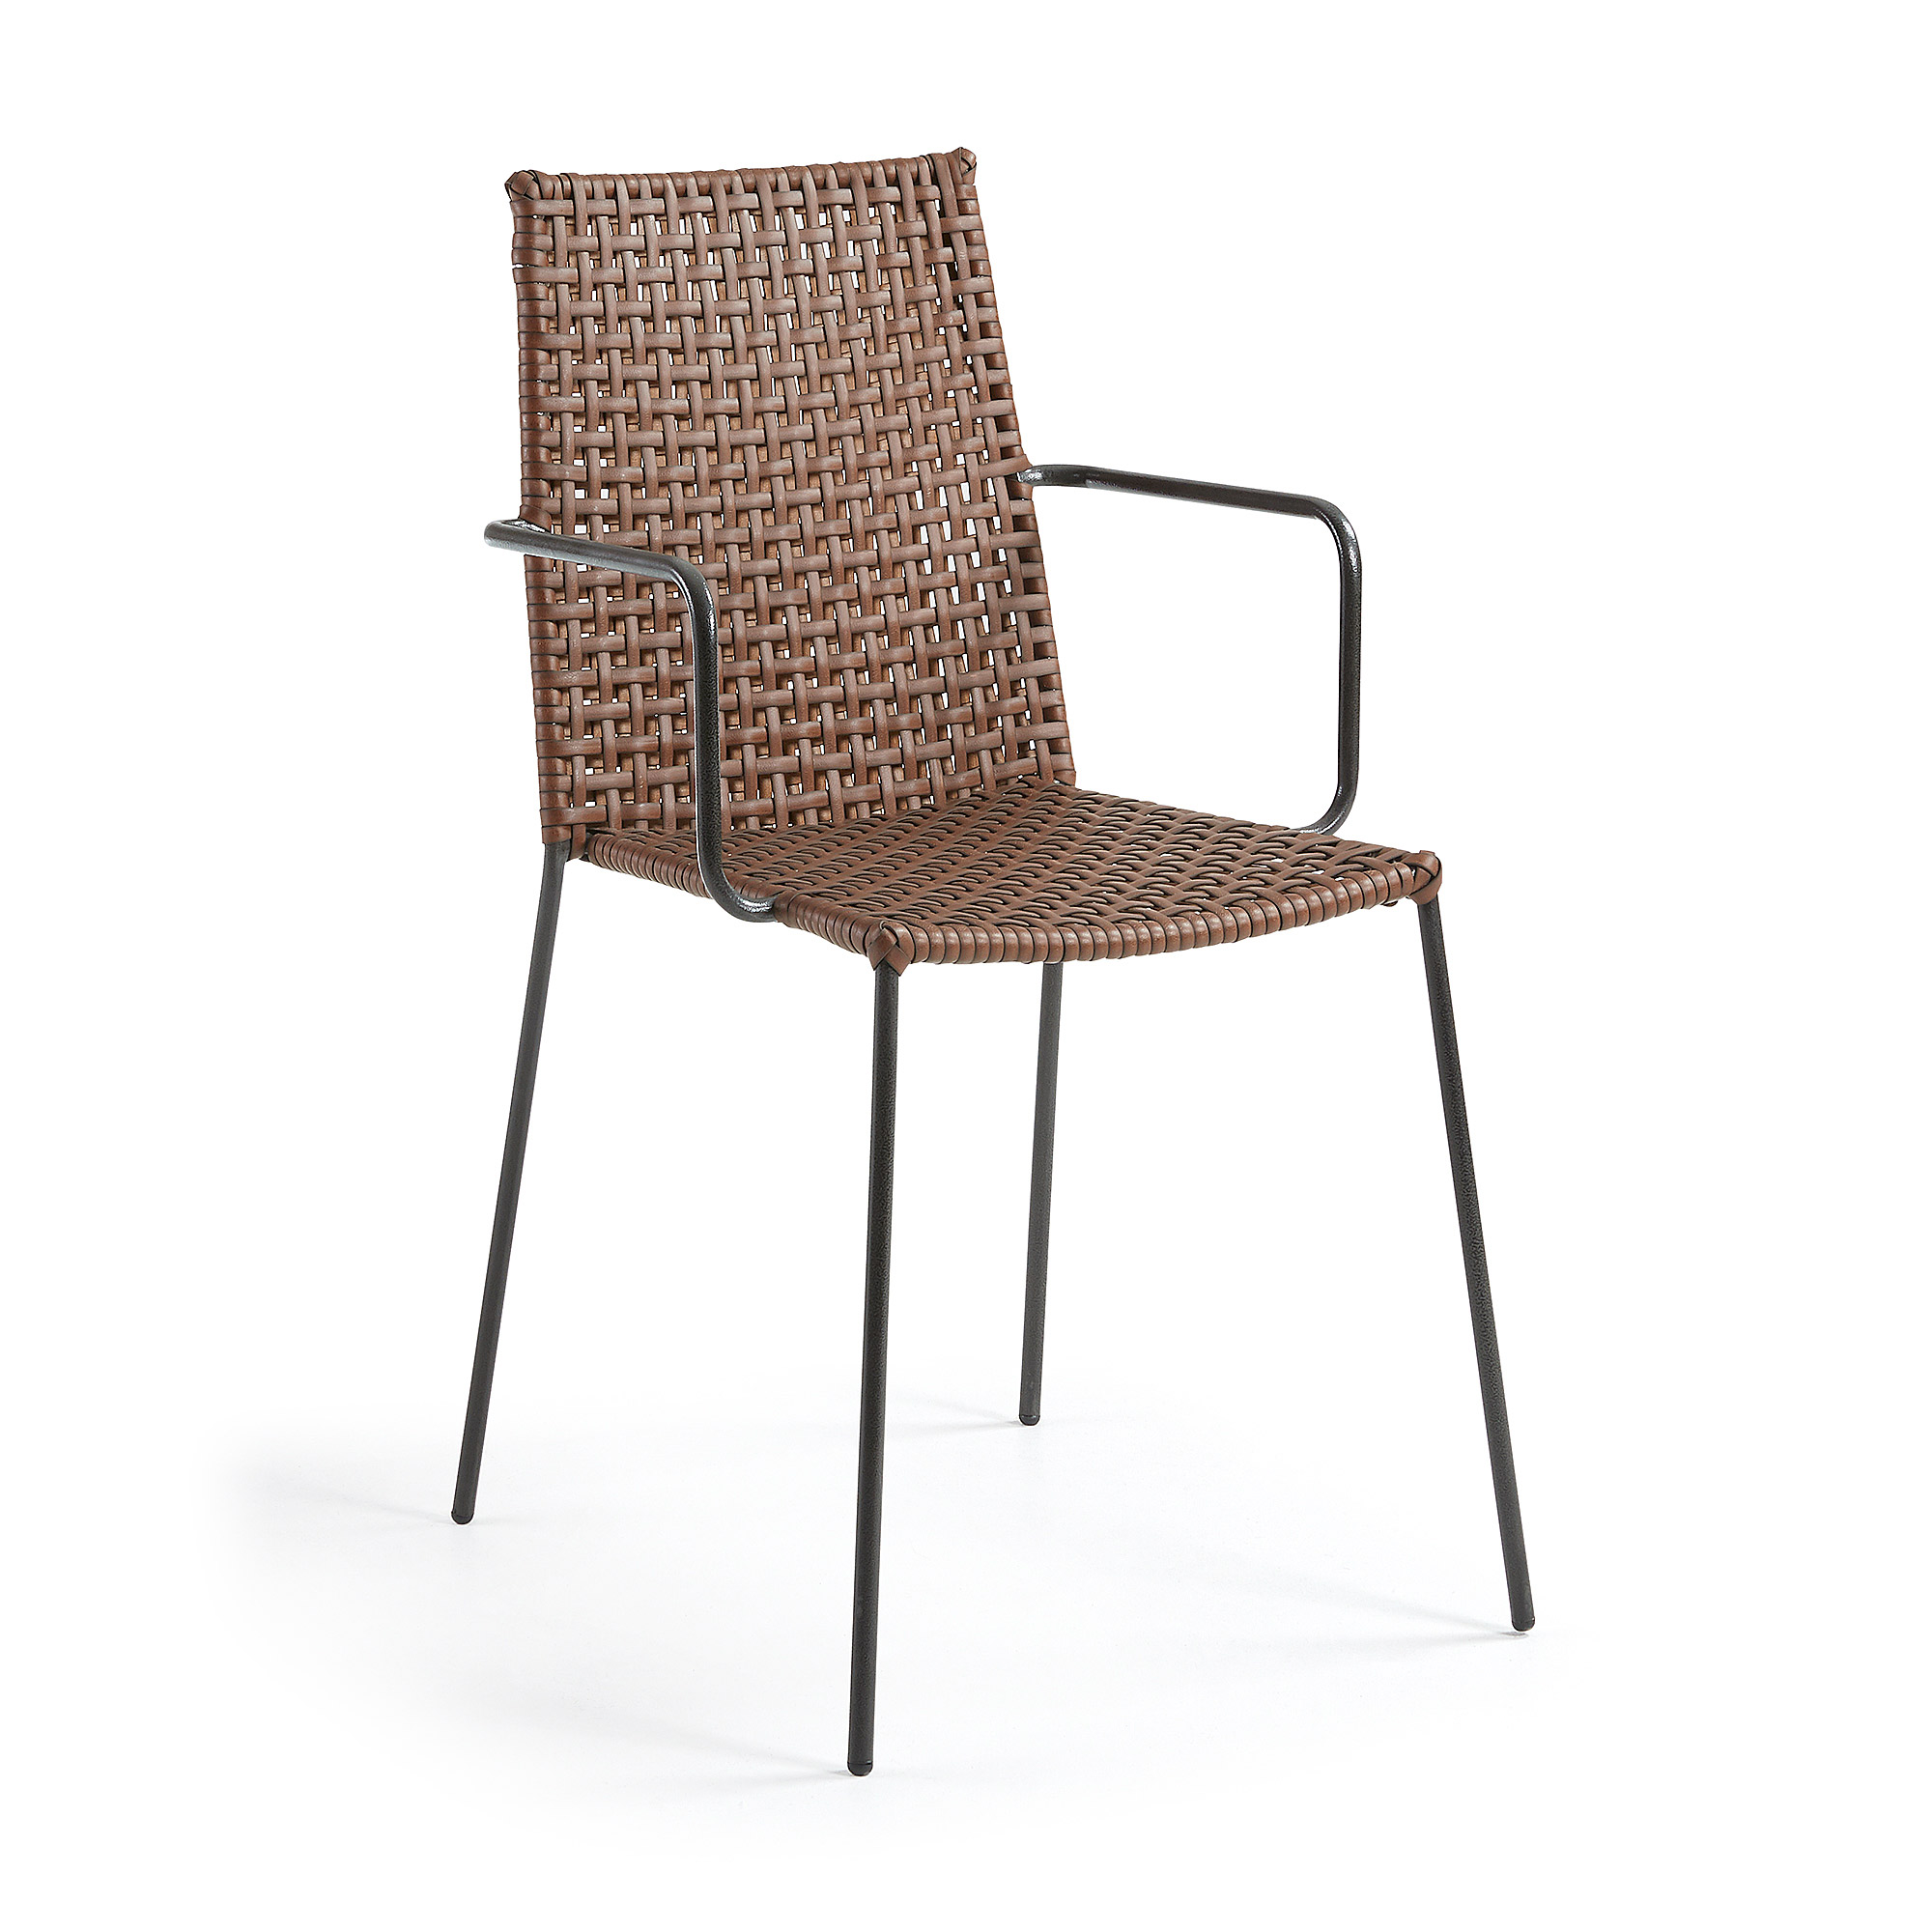 LAFORMA Blast lænestol - brun/grå syntetisk læder/stål, m. armlæn